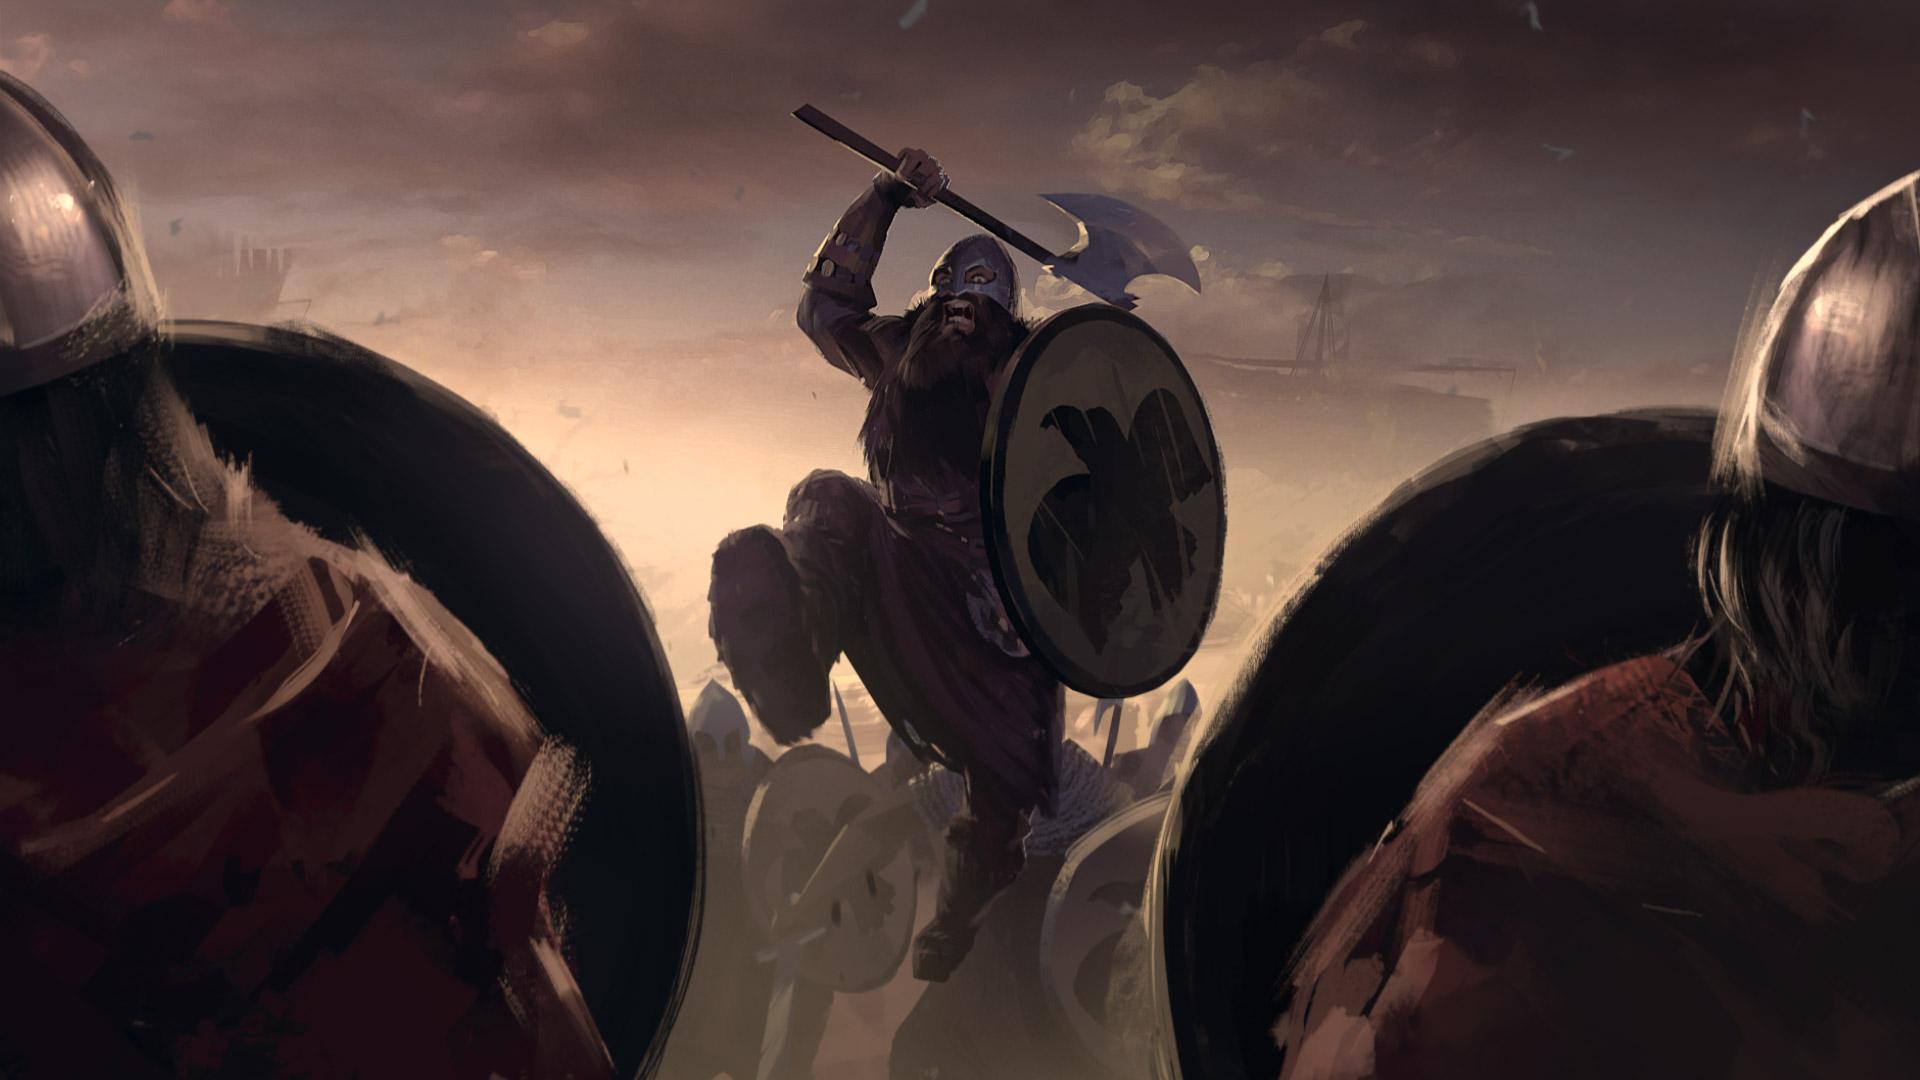 Free Total War Saga: Thrones of Britannia Wallpaper in 1920x1080